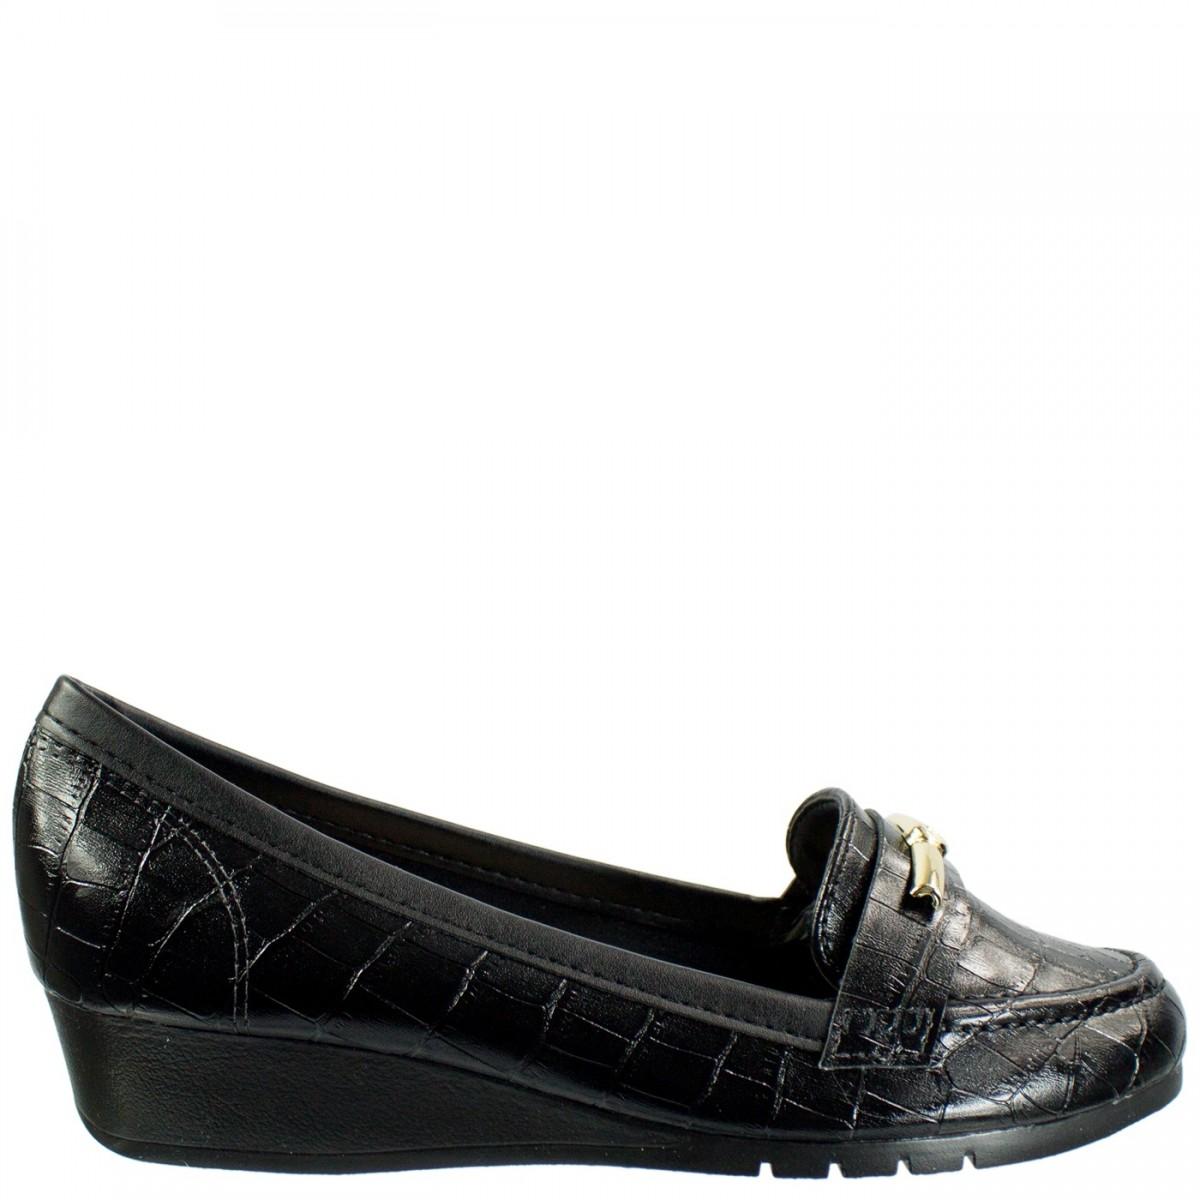 580c3b225 Bizz Store - Sapato Feminino Moleca Mini Floter Metal Anabela